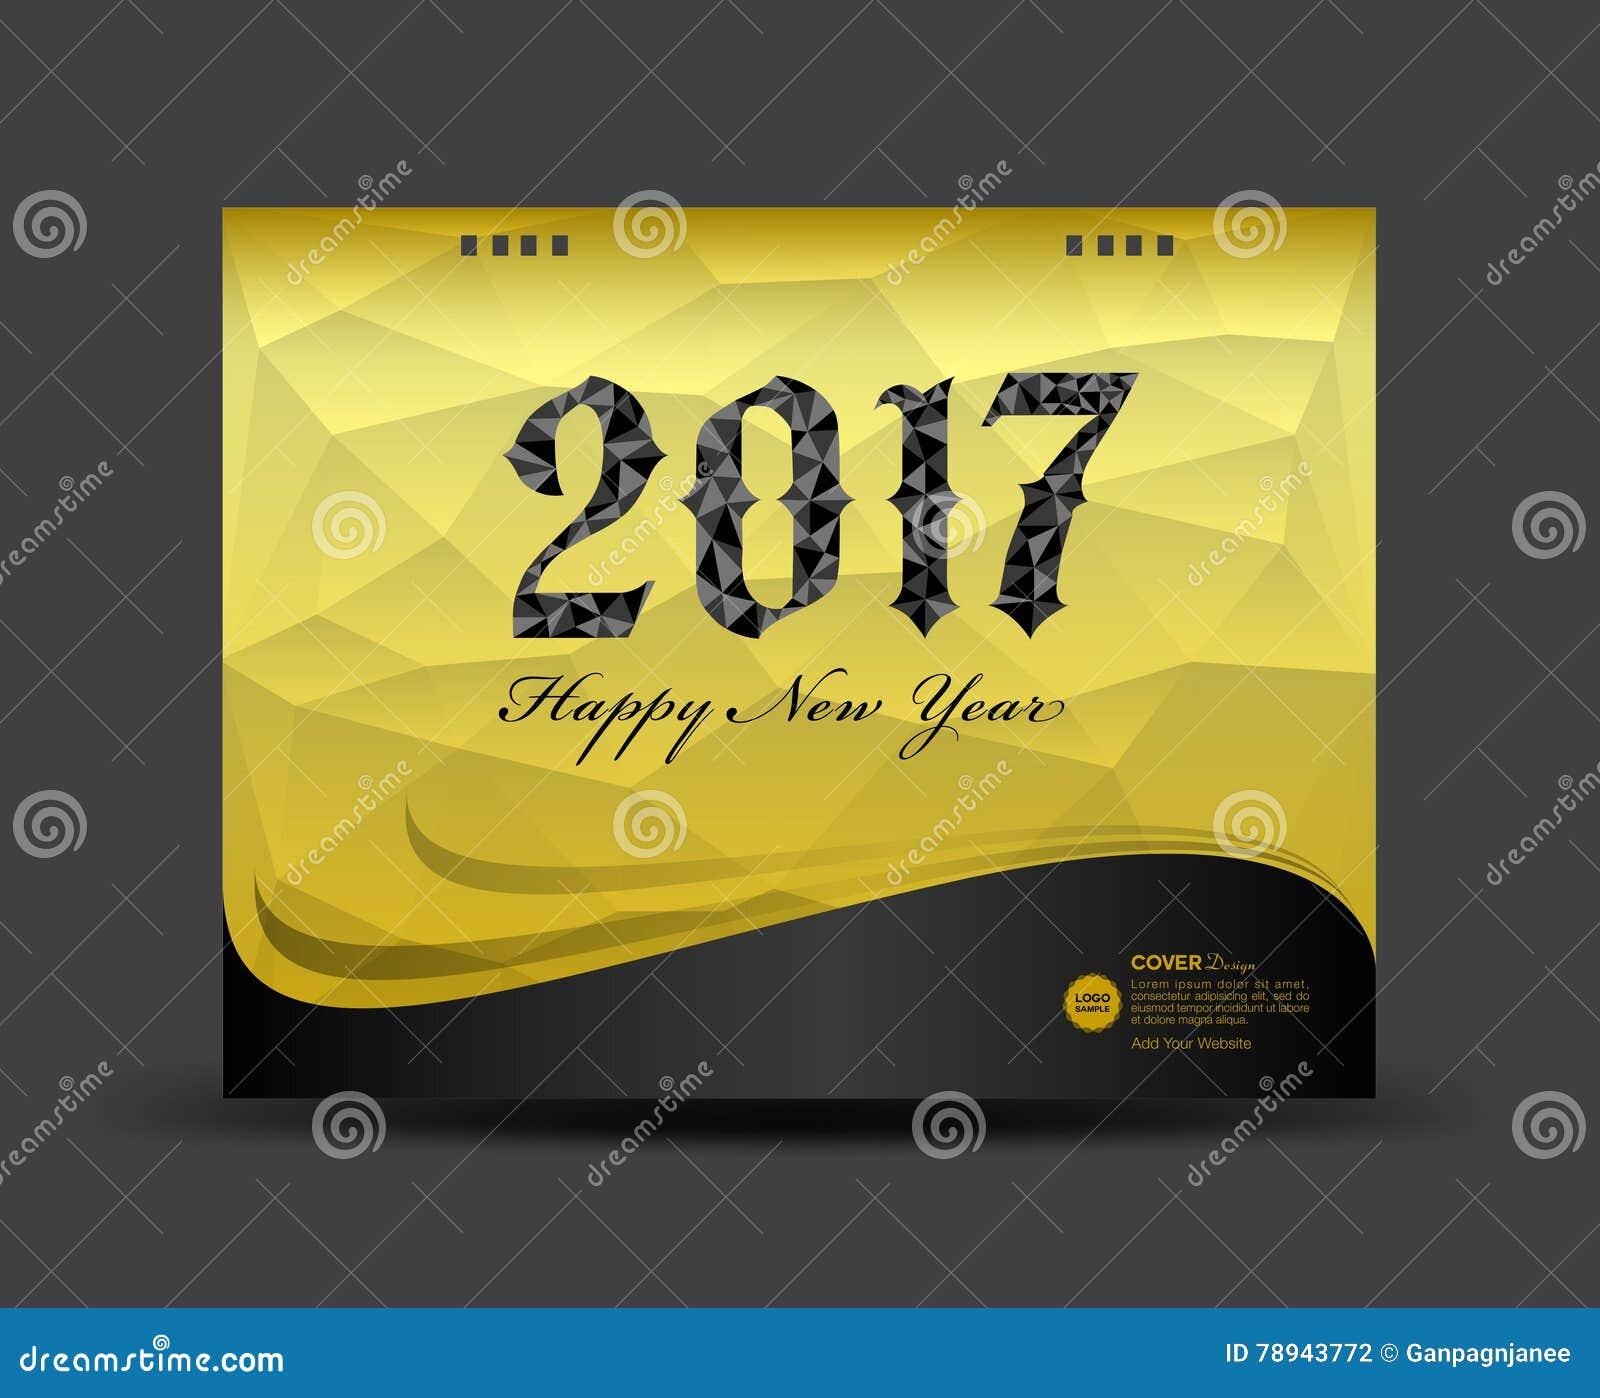 cover desk calendar 2017 happy new year 2017 book cover templa